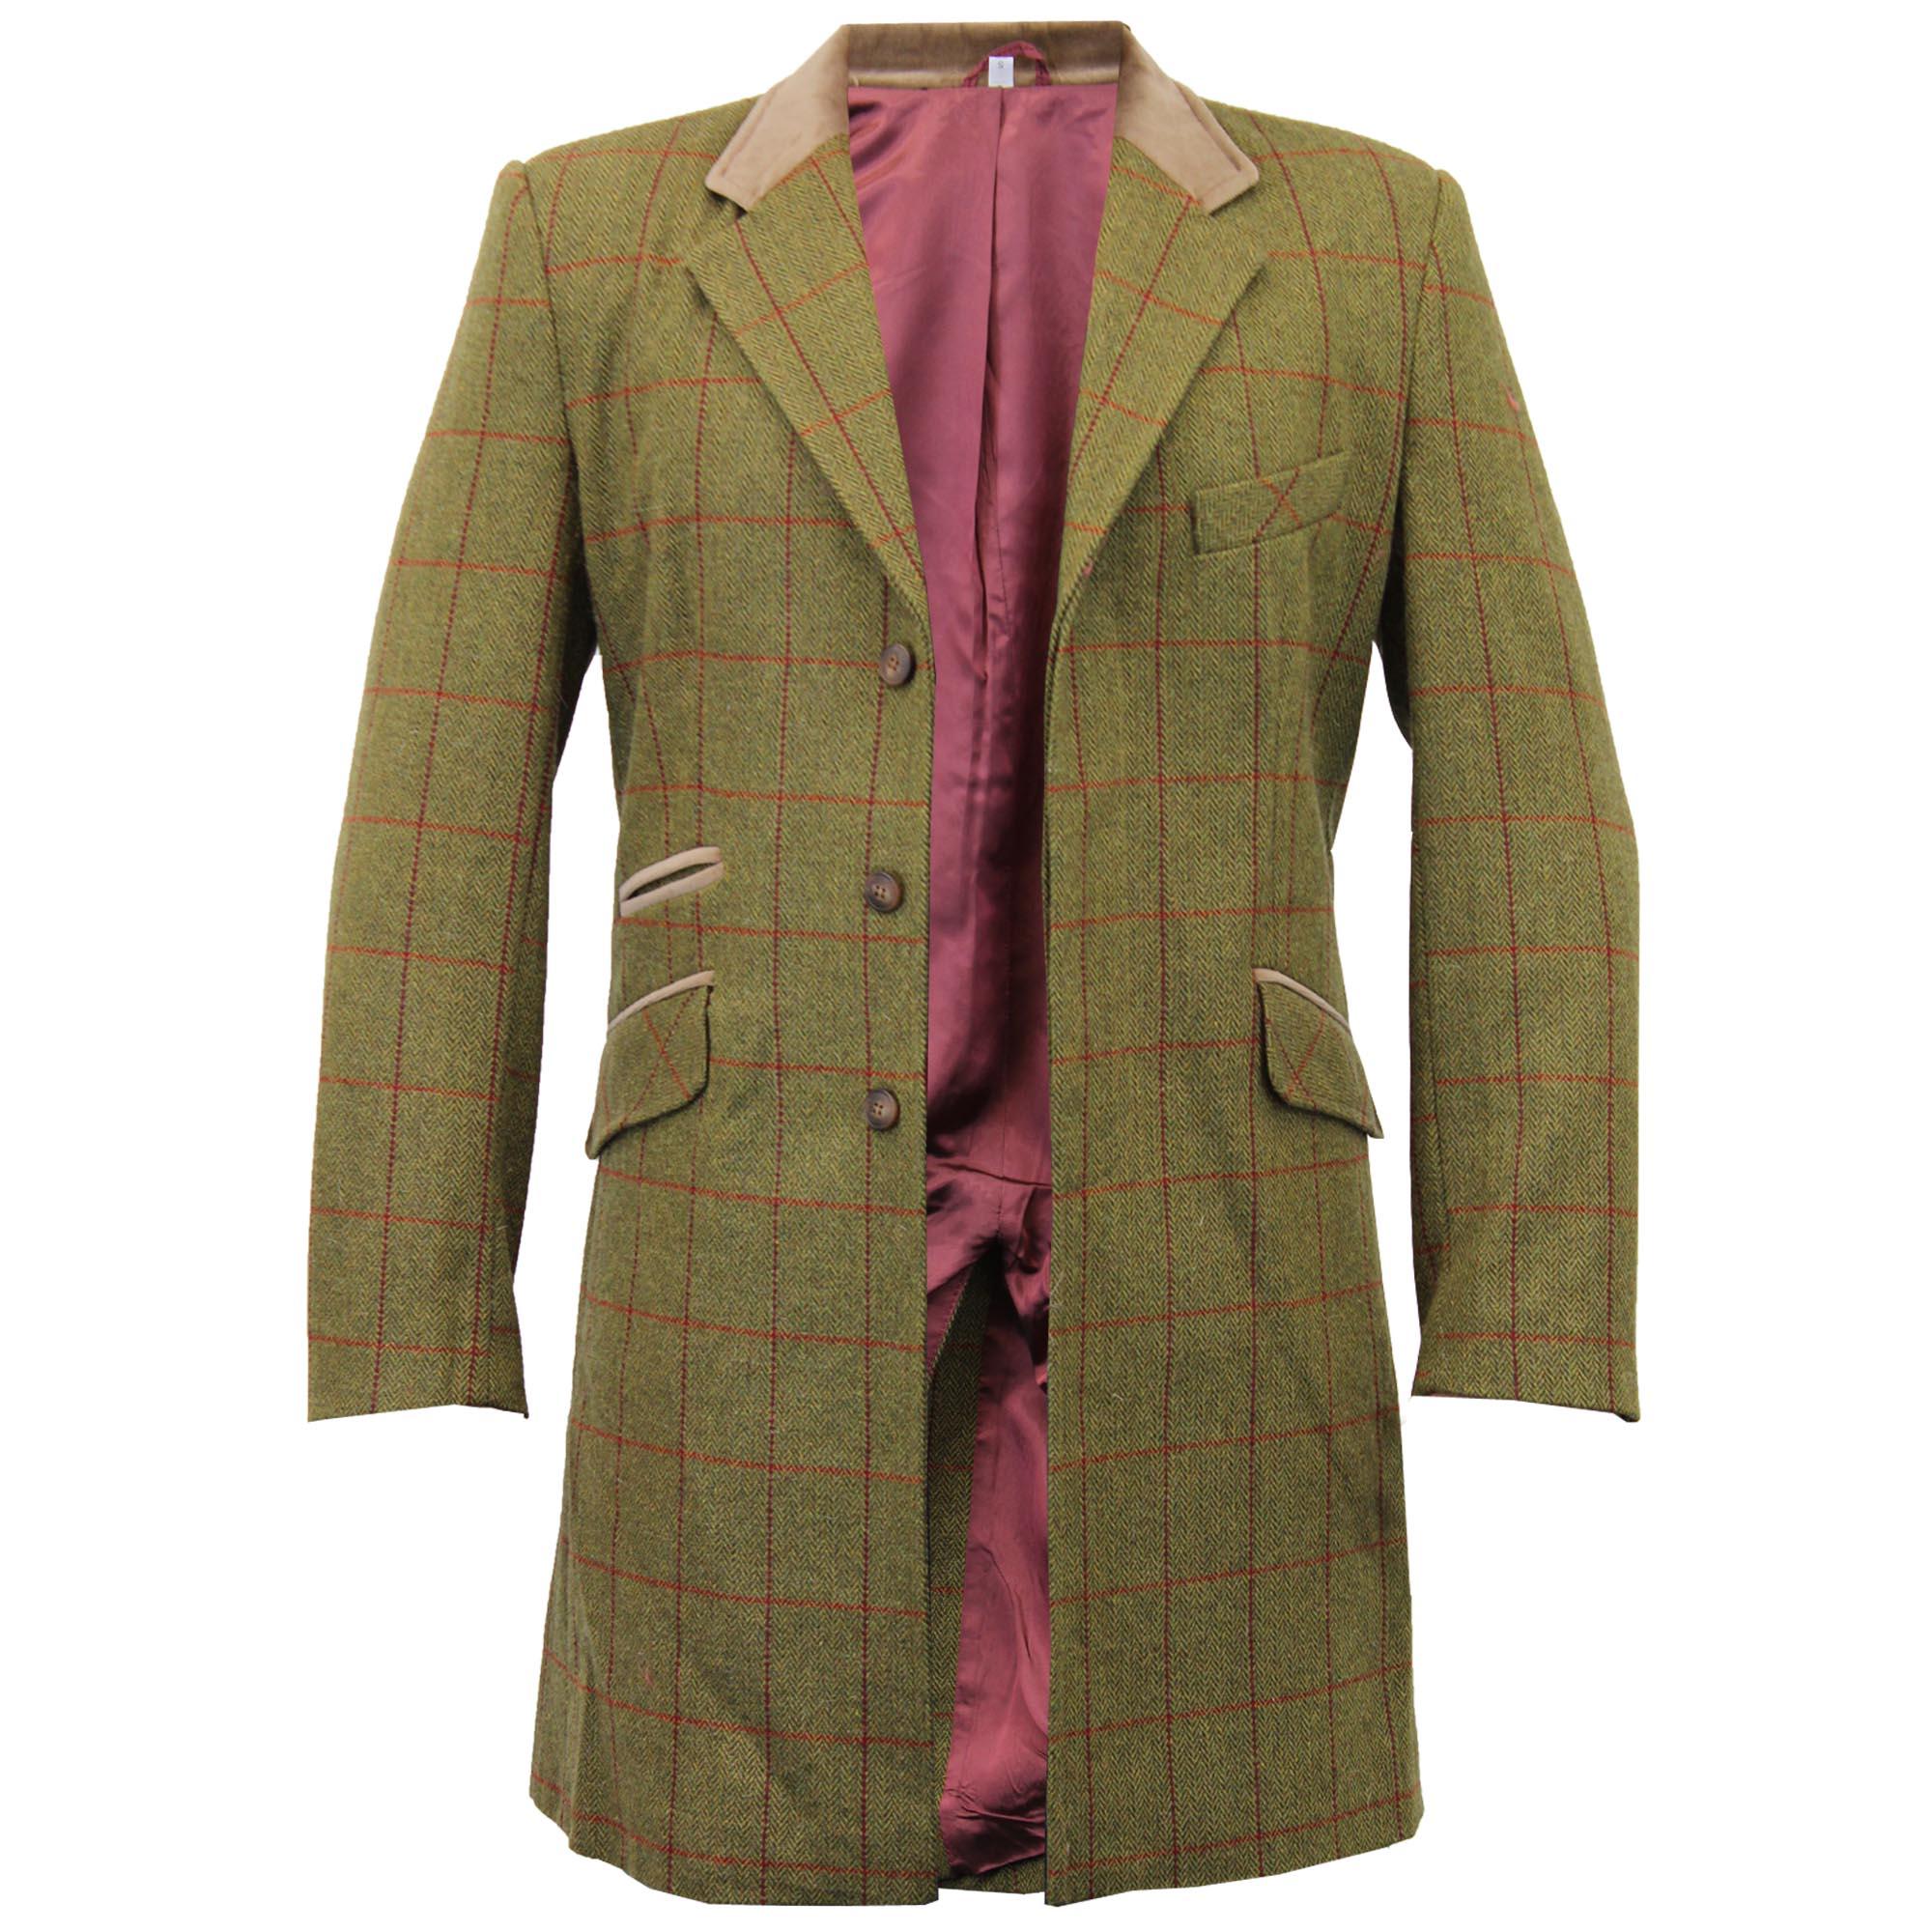 Tweed overcoats